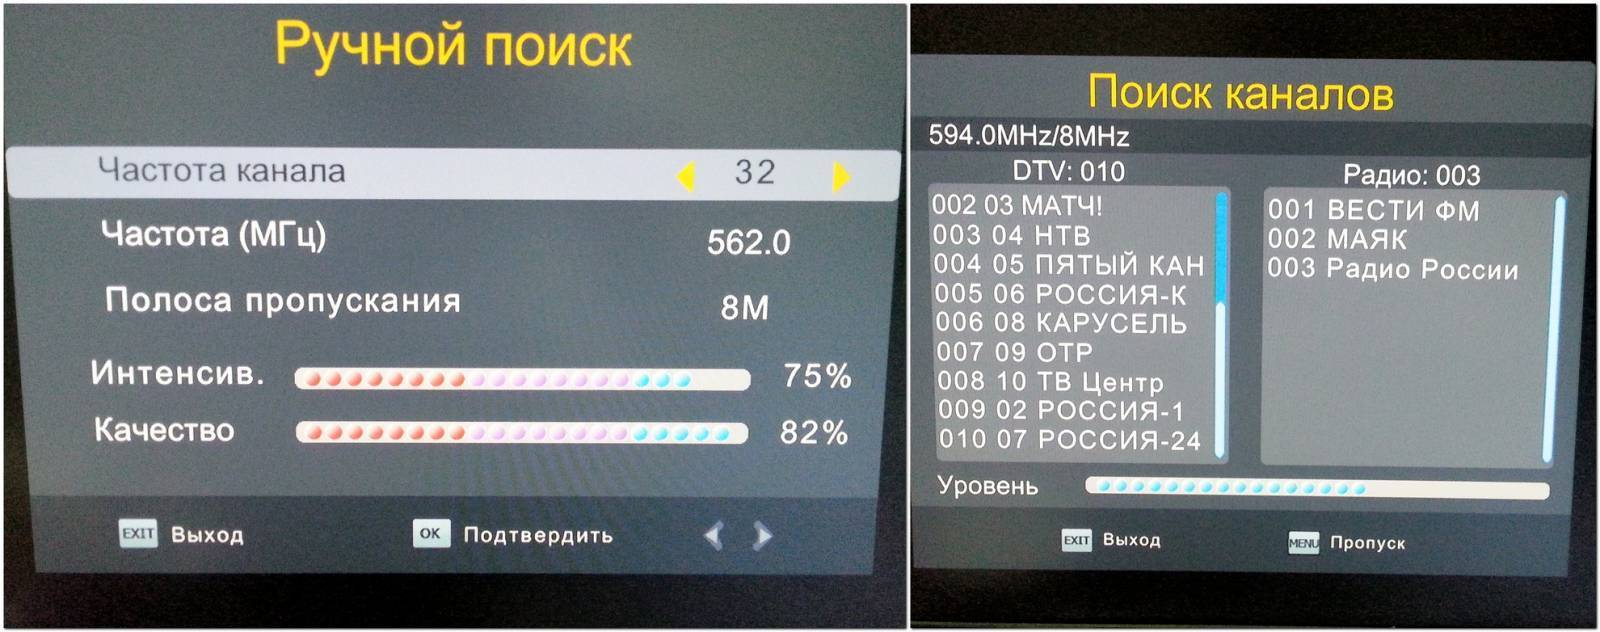 На какой частоте вещает цифровое телевидение DVB-T2